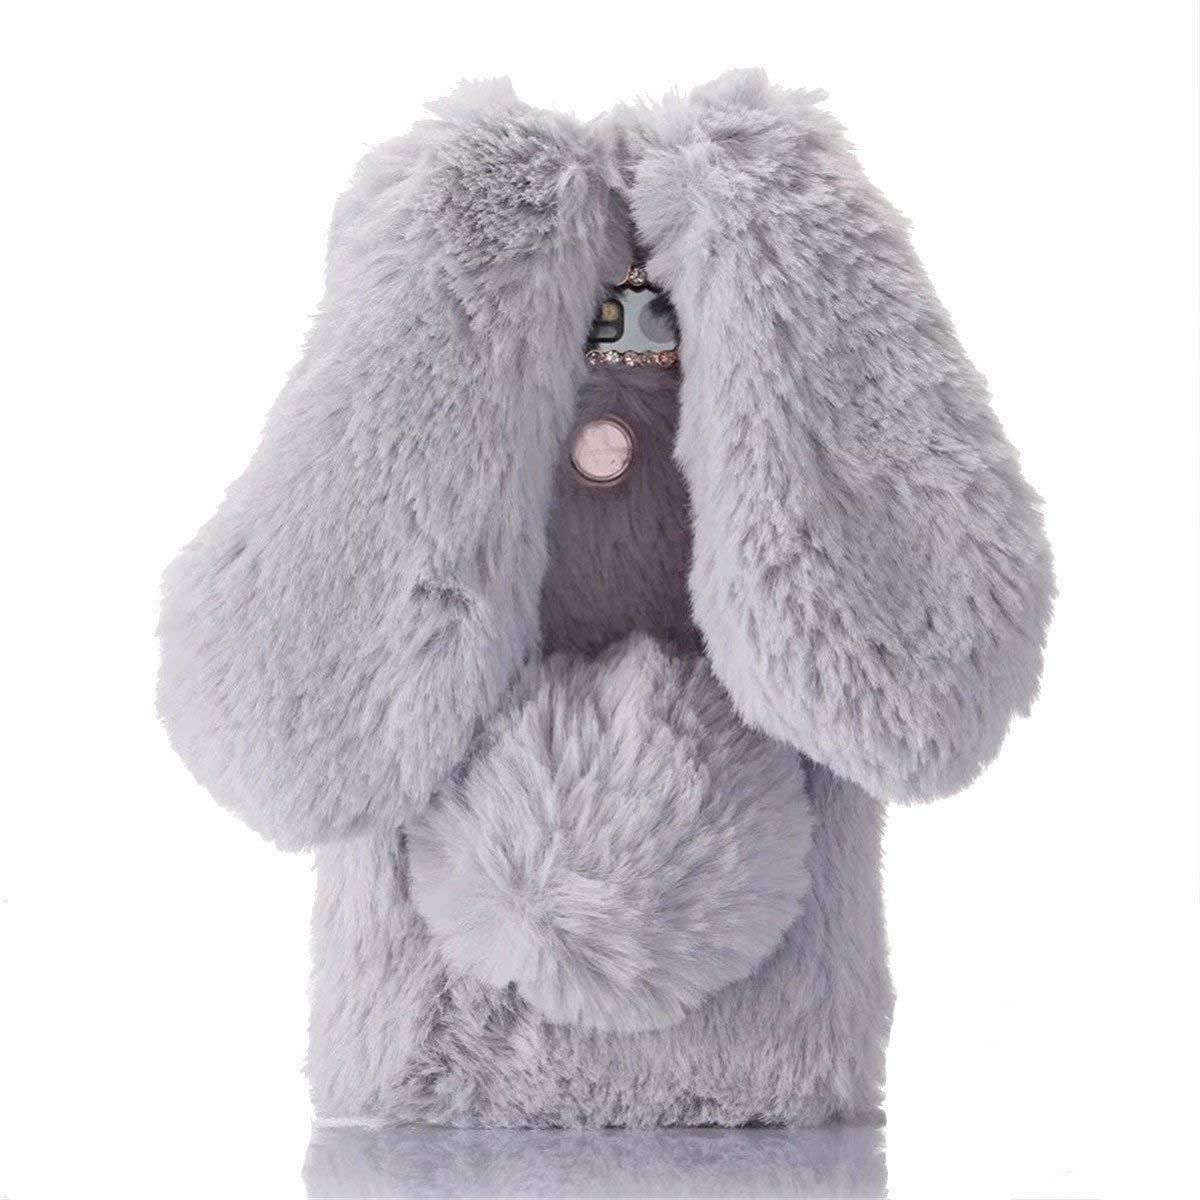 Galaxy S9 Case, [Plush Rabbit Case] Rabbit Bunny Furry Fur Bling Crystal Rhinestone Warm Design Soft Rabbit Fur Hair Plush Case for Samsung Galaxy S9(Light Gray)